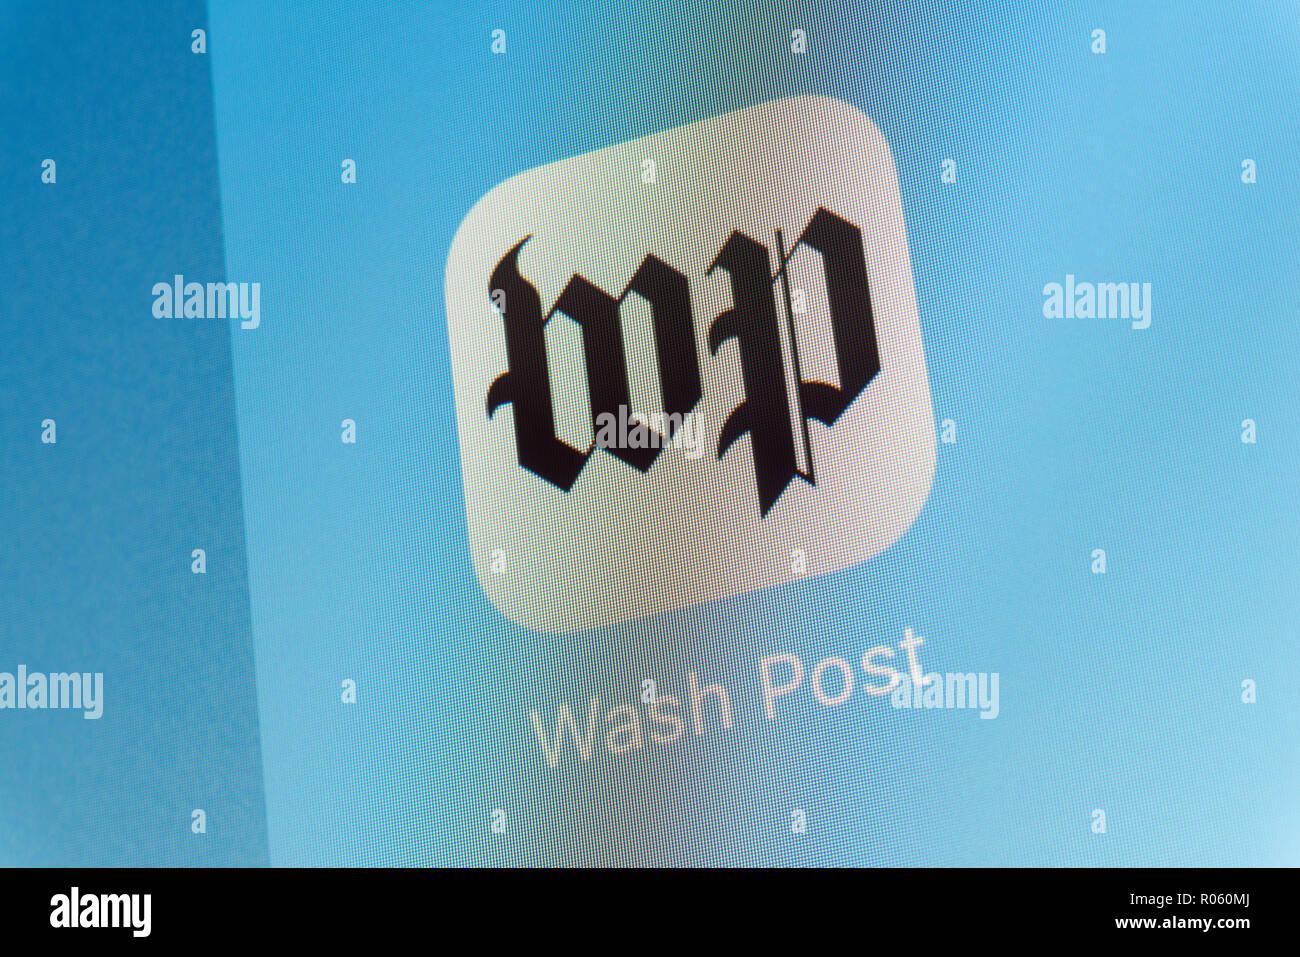 Washington Post App on cellphone screen - Stock Image